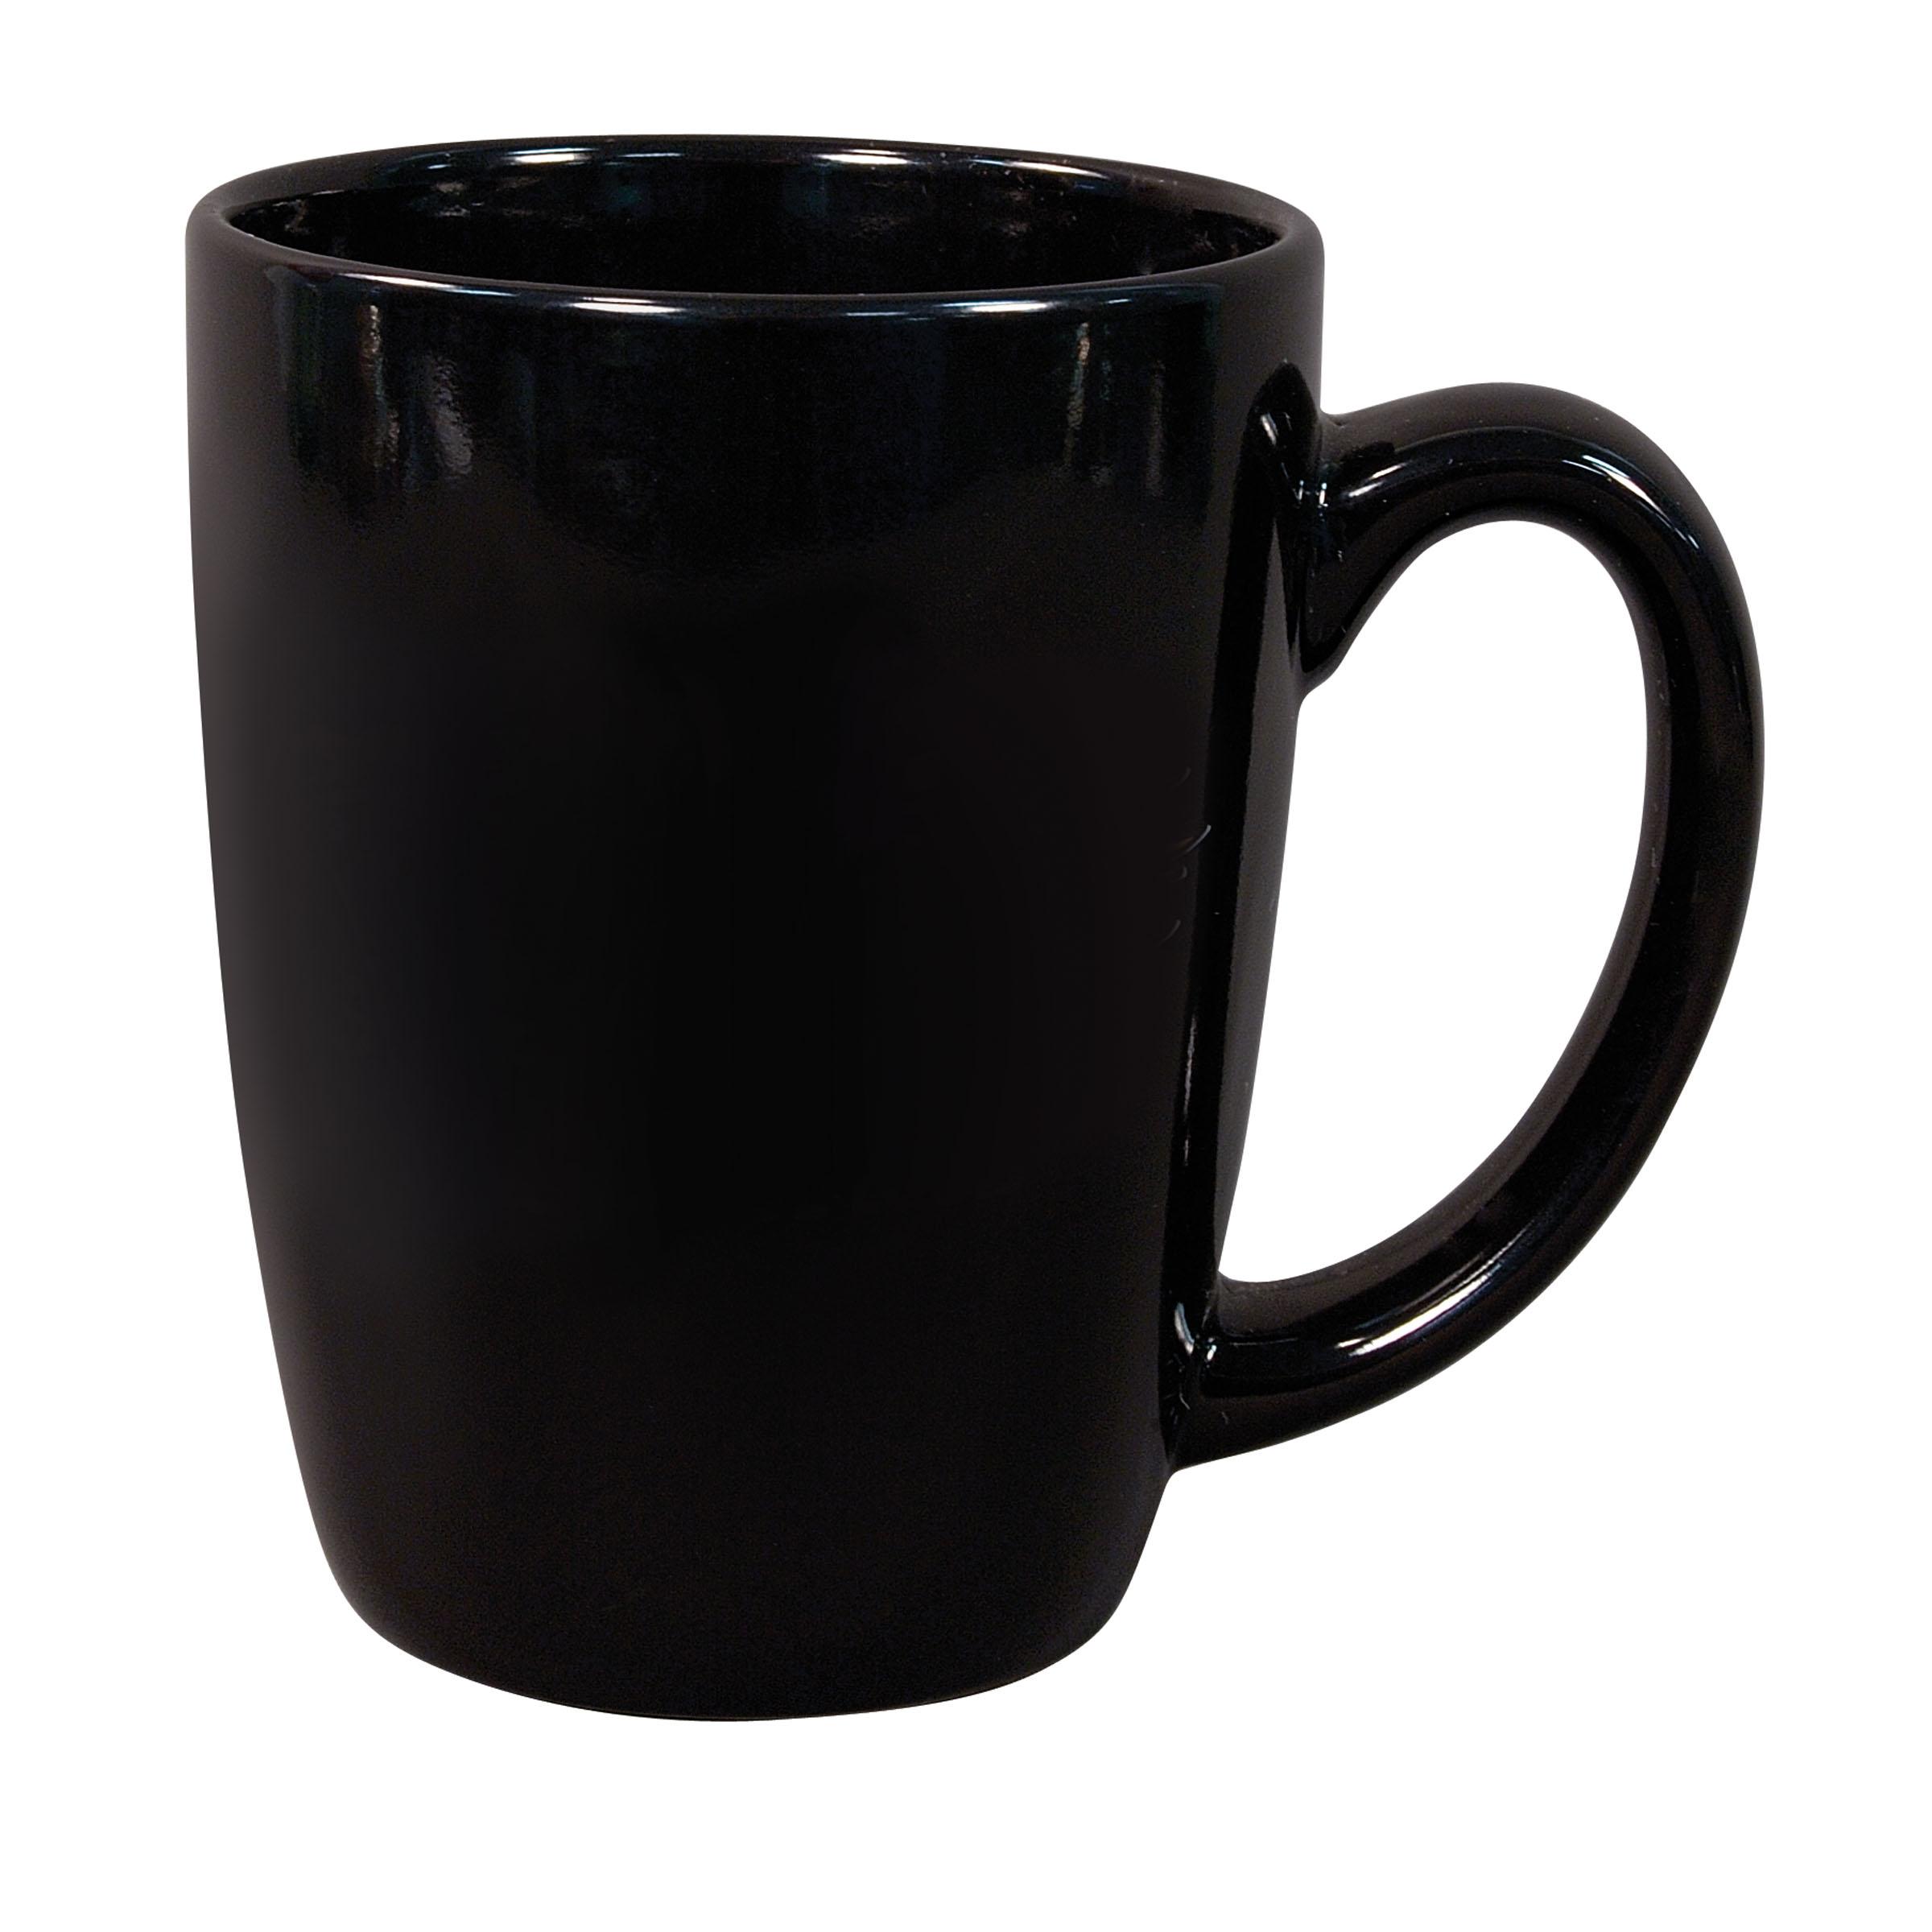 Pottery Mug, 16 oz, handthrown ceramic mug, stoneware ...  |Black Stoneware Pottery Mug